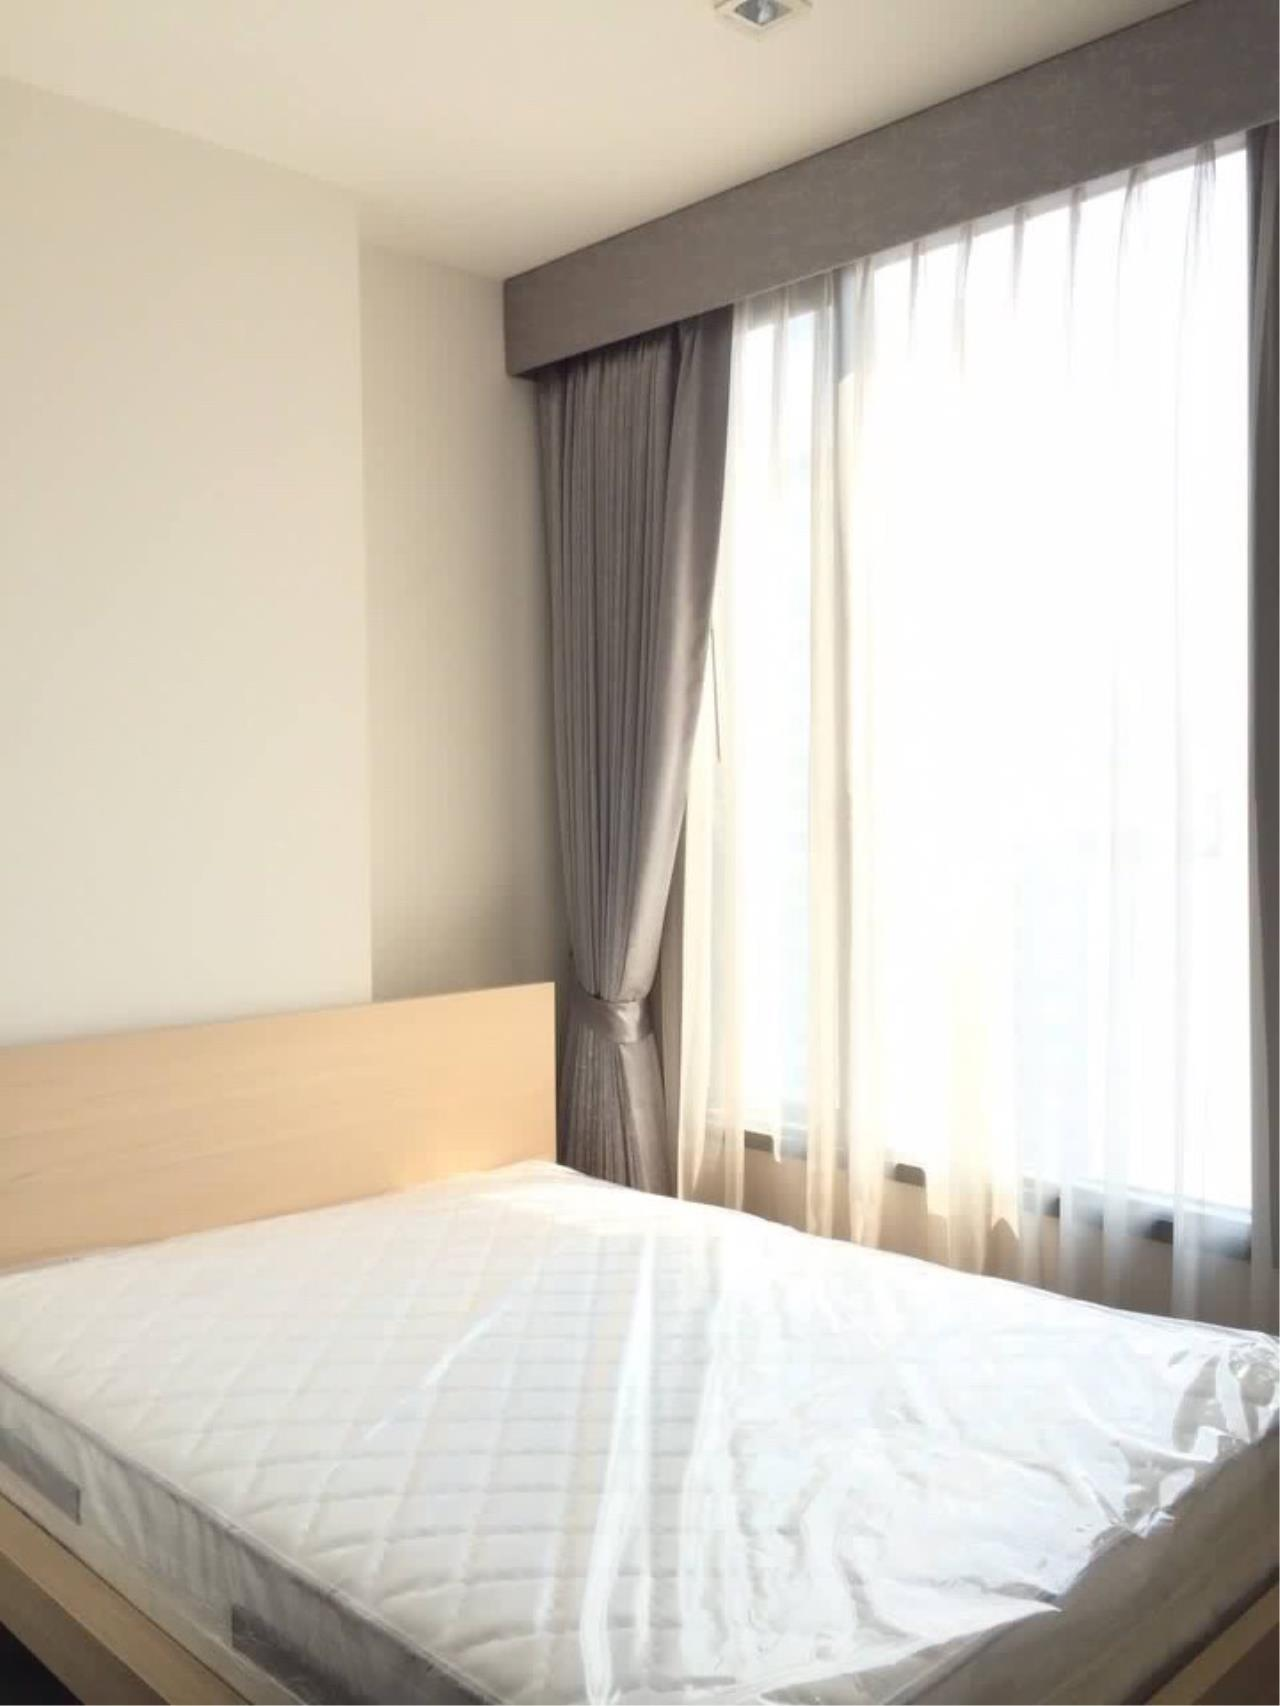 RE/MAX All Star Realty Agency's Edge Sukhumvit23 one bed for rent (BTS Asoke / MRT Sukhumvit) 4